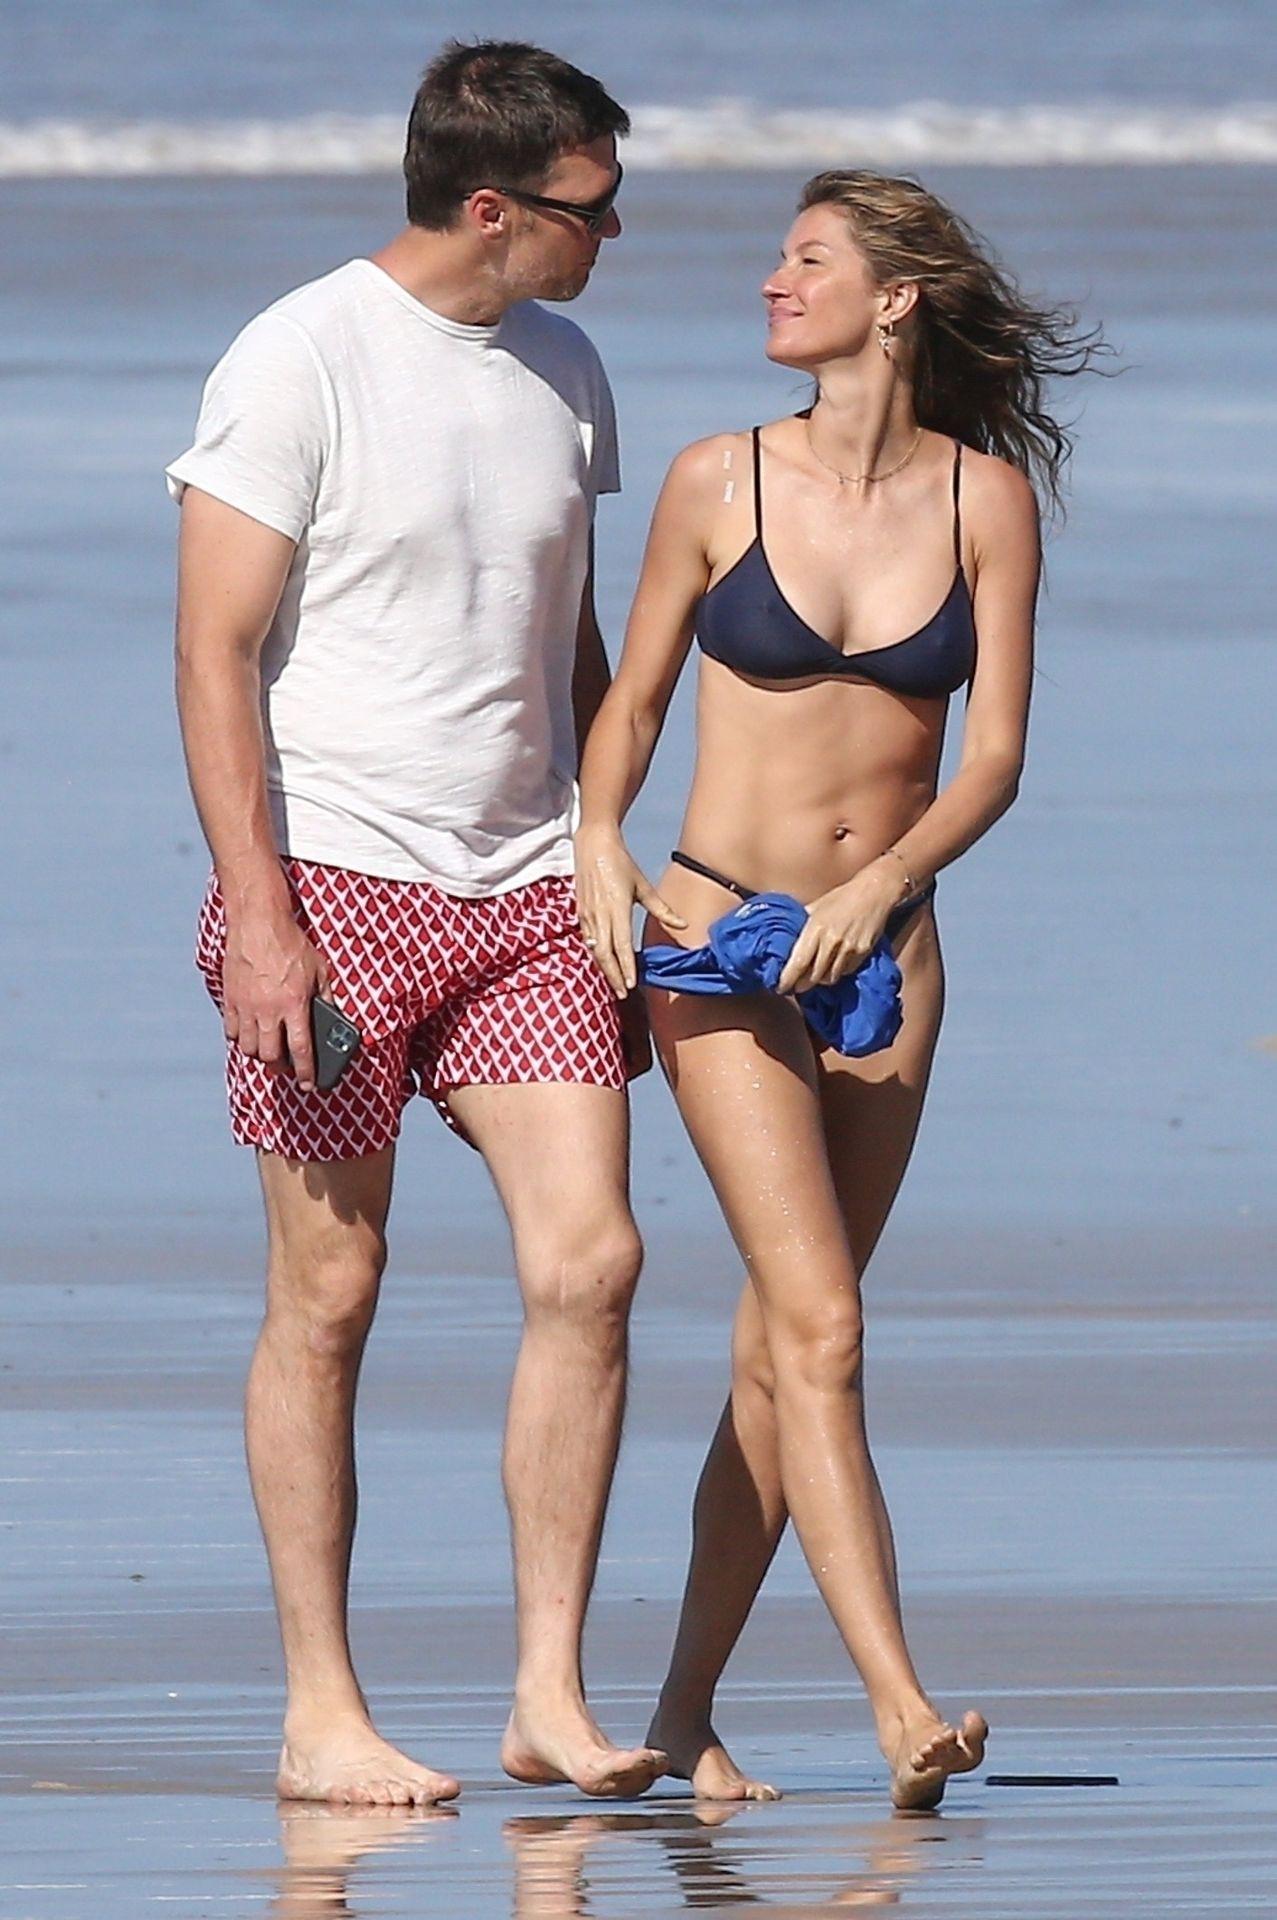 Tom Brady & Gisele Bundchen Pack On The Pda At The Beach 0029